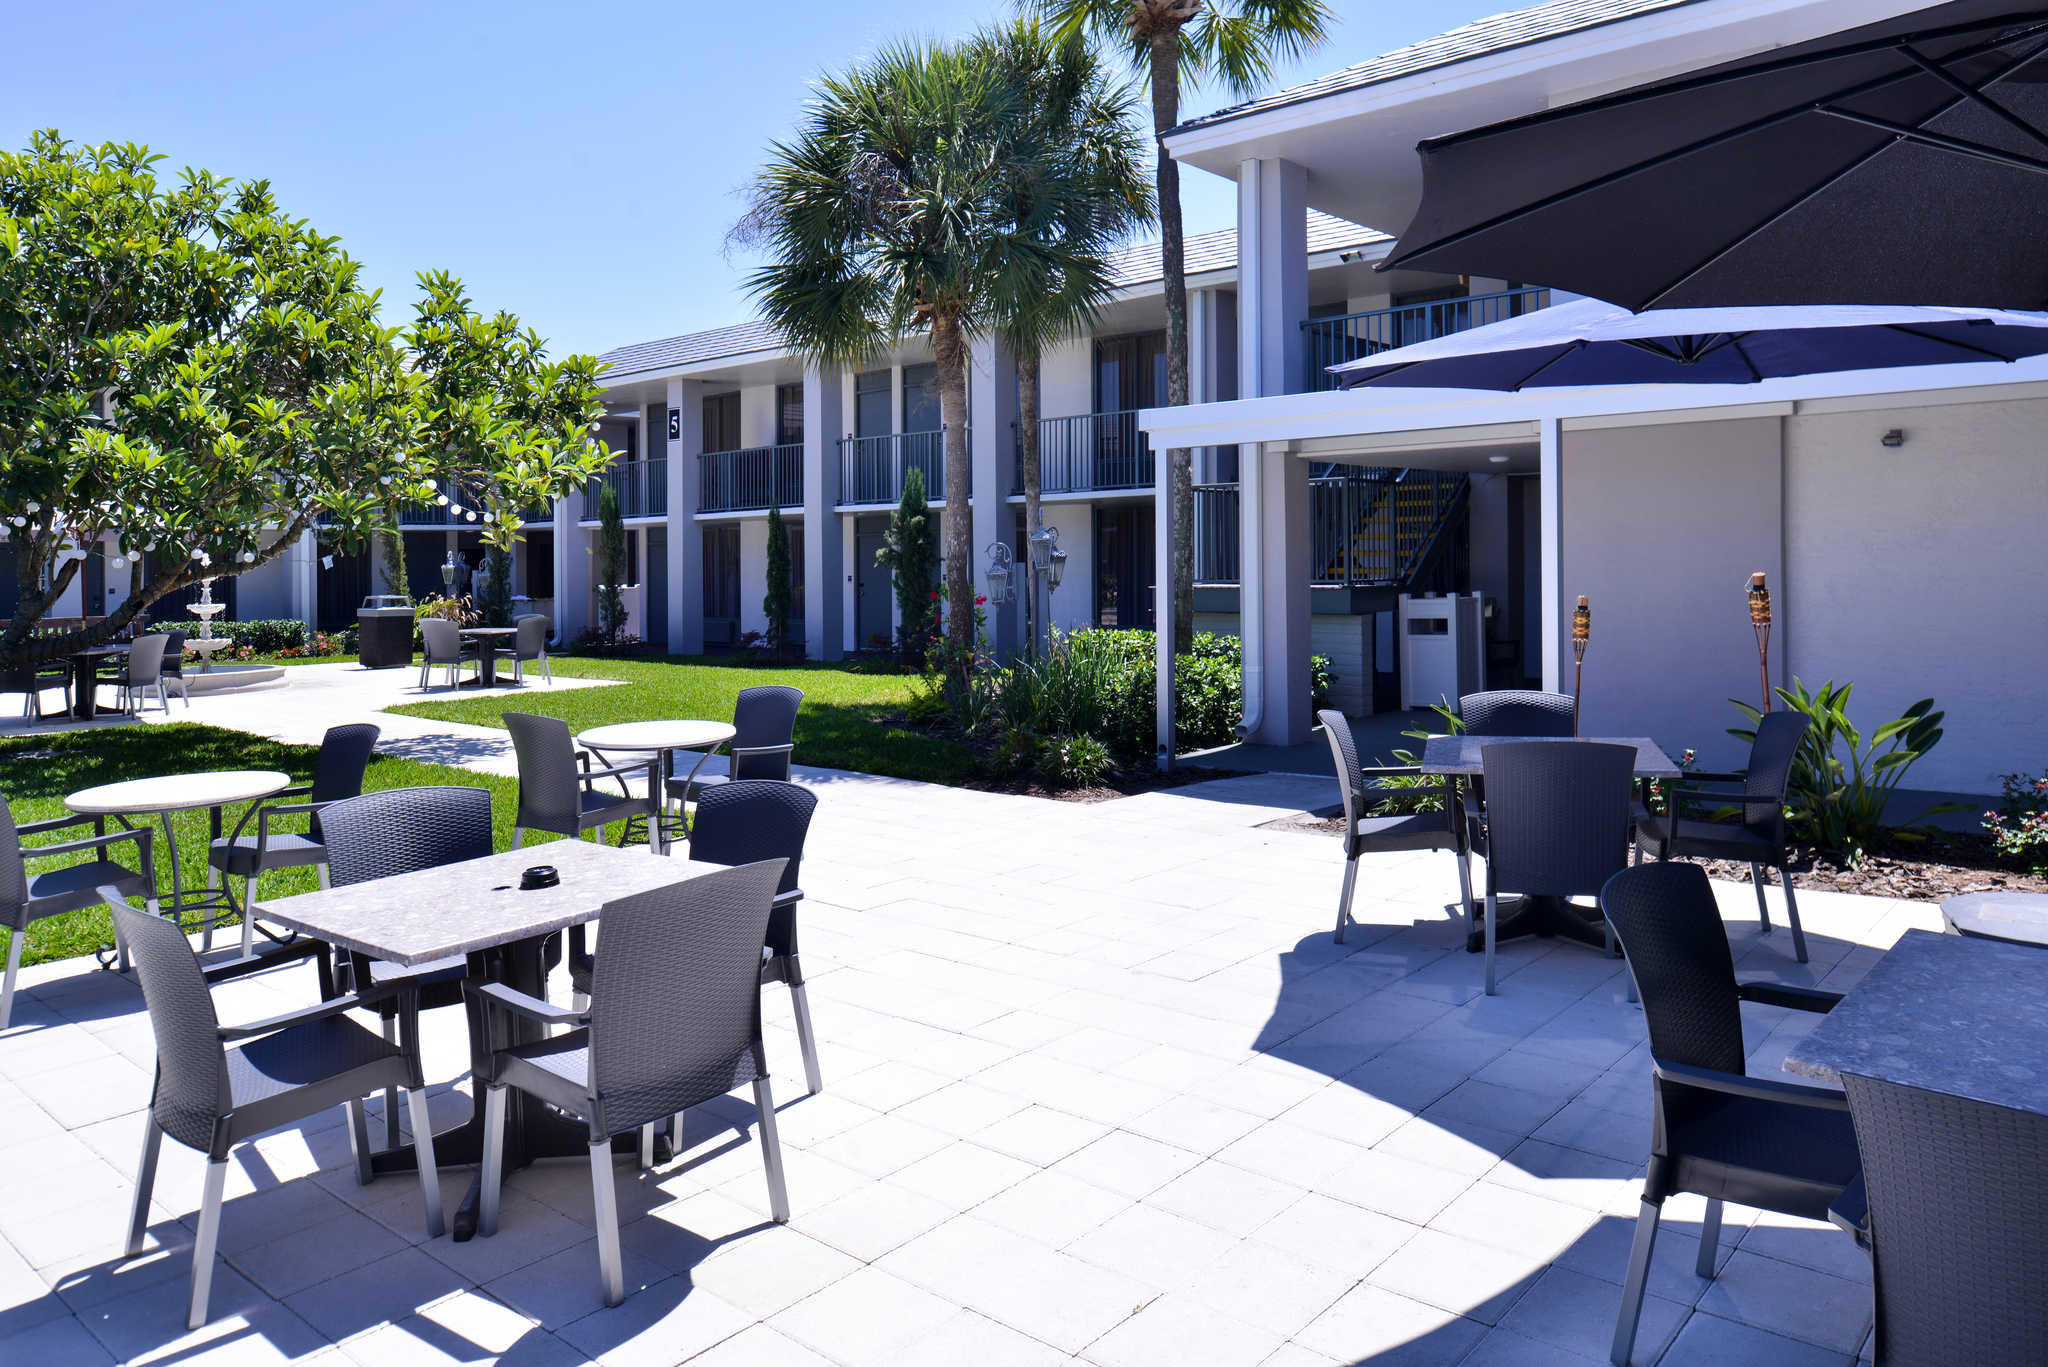 Clarion Inn & Suites Orlando near Theme Parks image 25